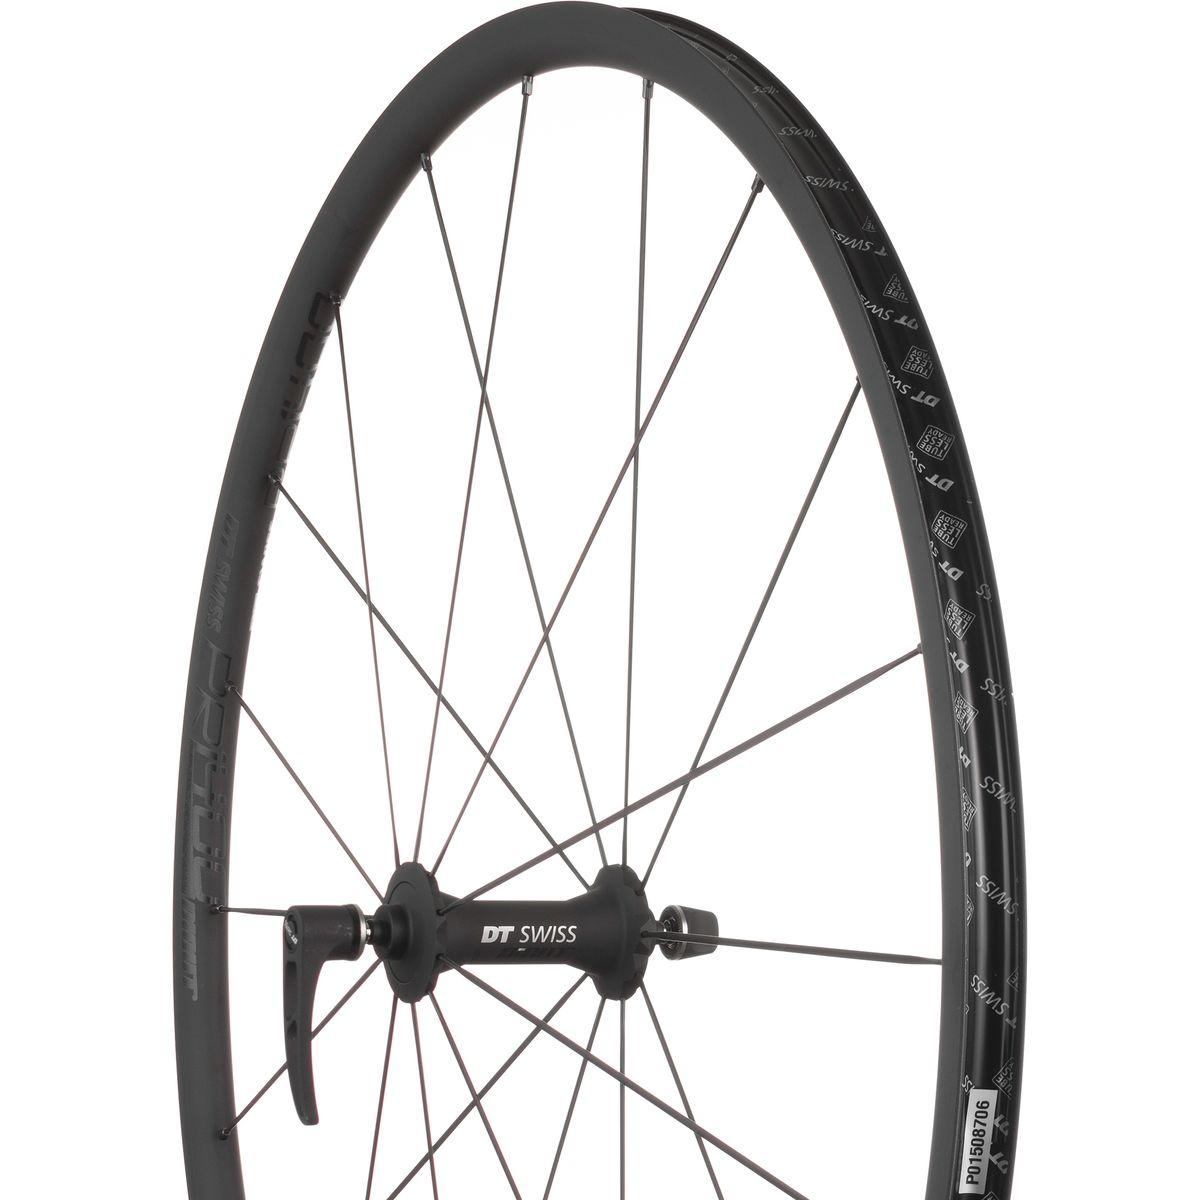 1200x1200 Dt Swiss Pr 1400 Dicut Oxic Road Wheel